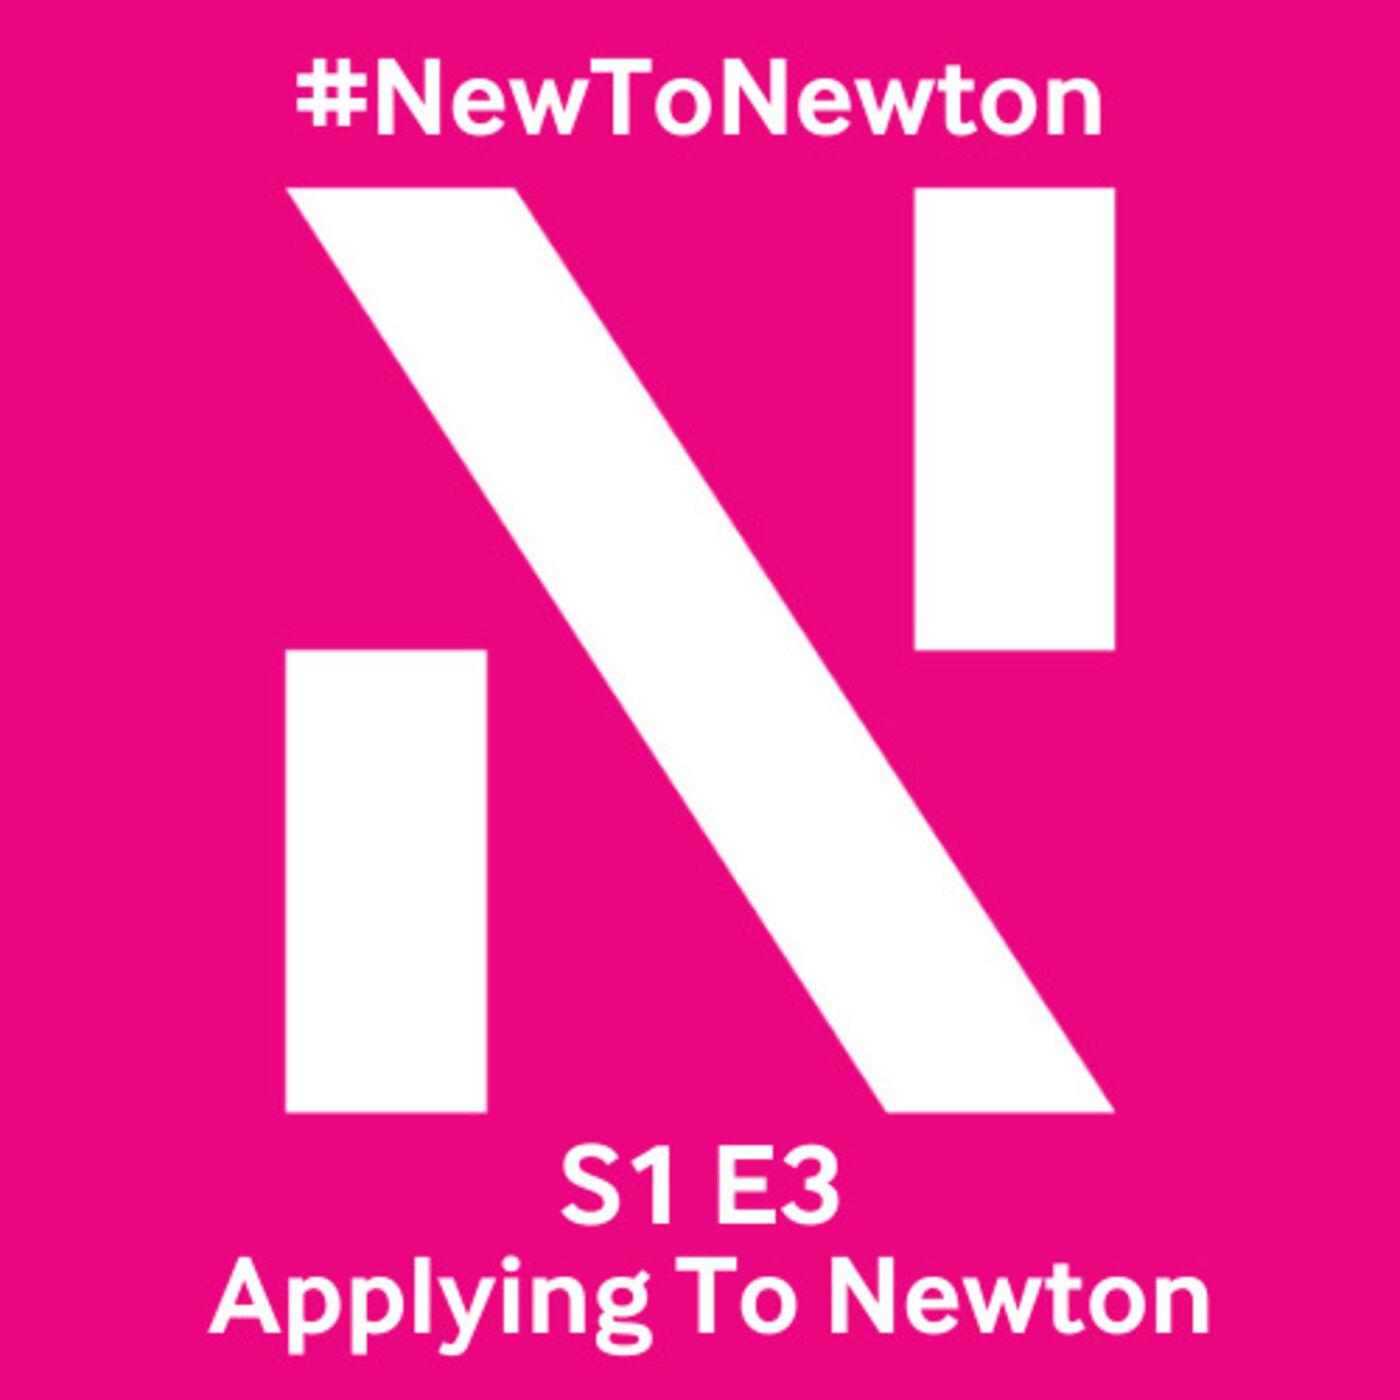 Applying to Newton